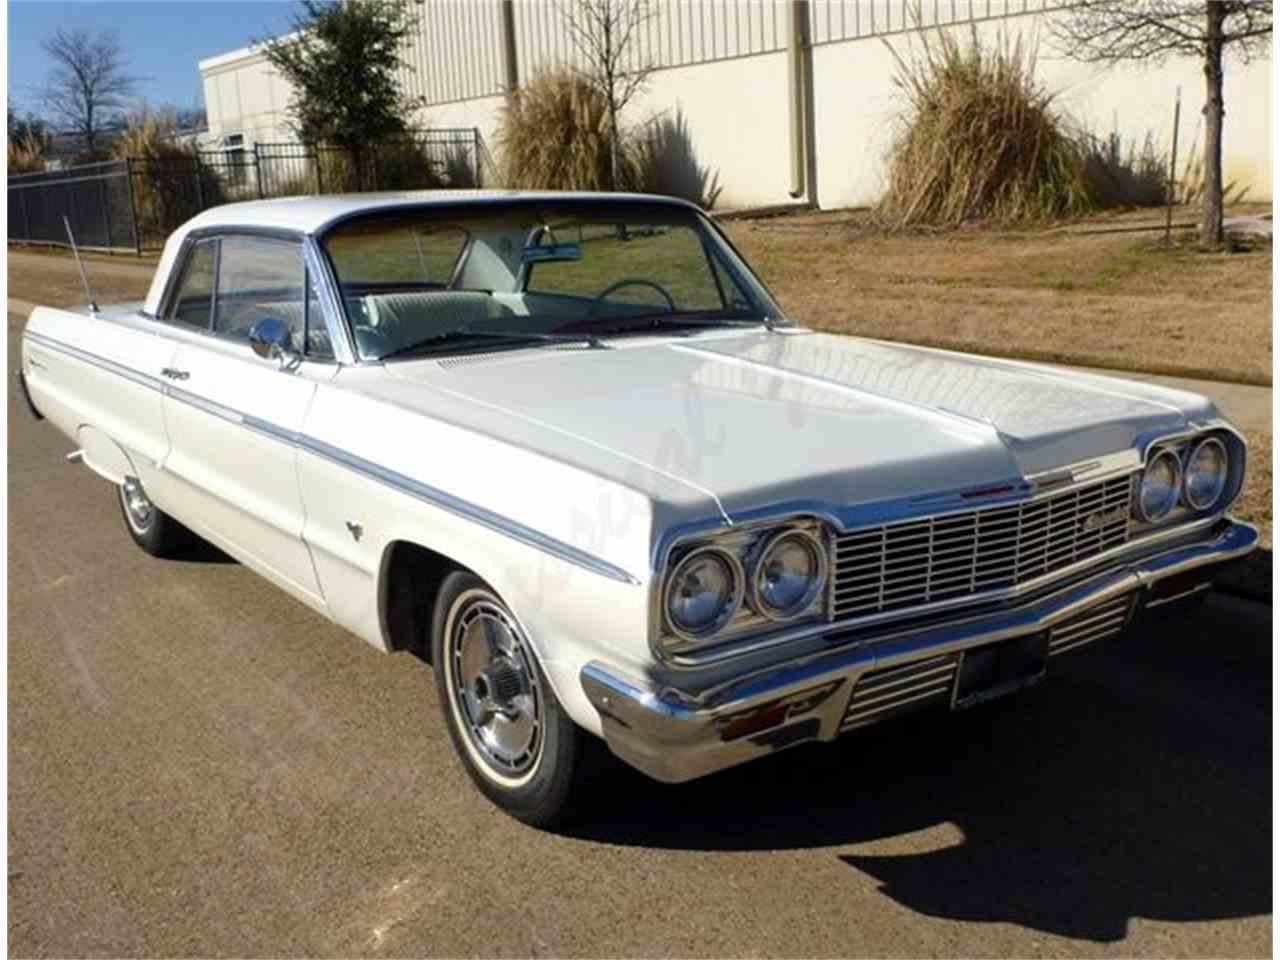 1964 Impala Ss Convertible Craigslist